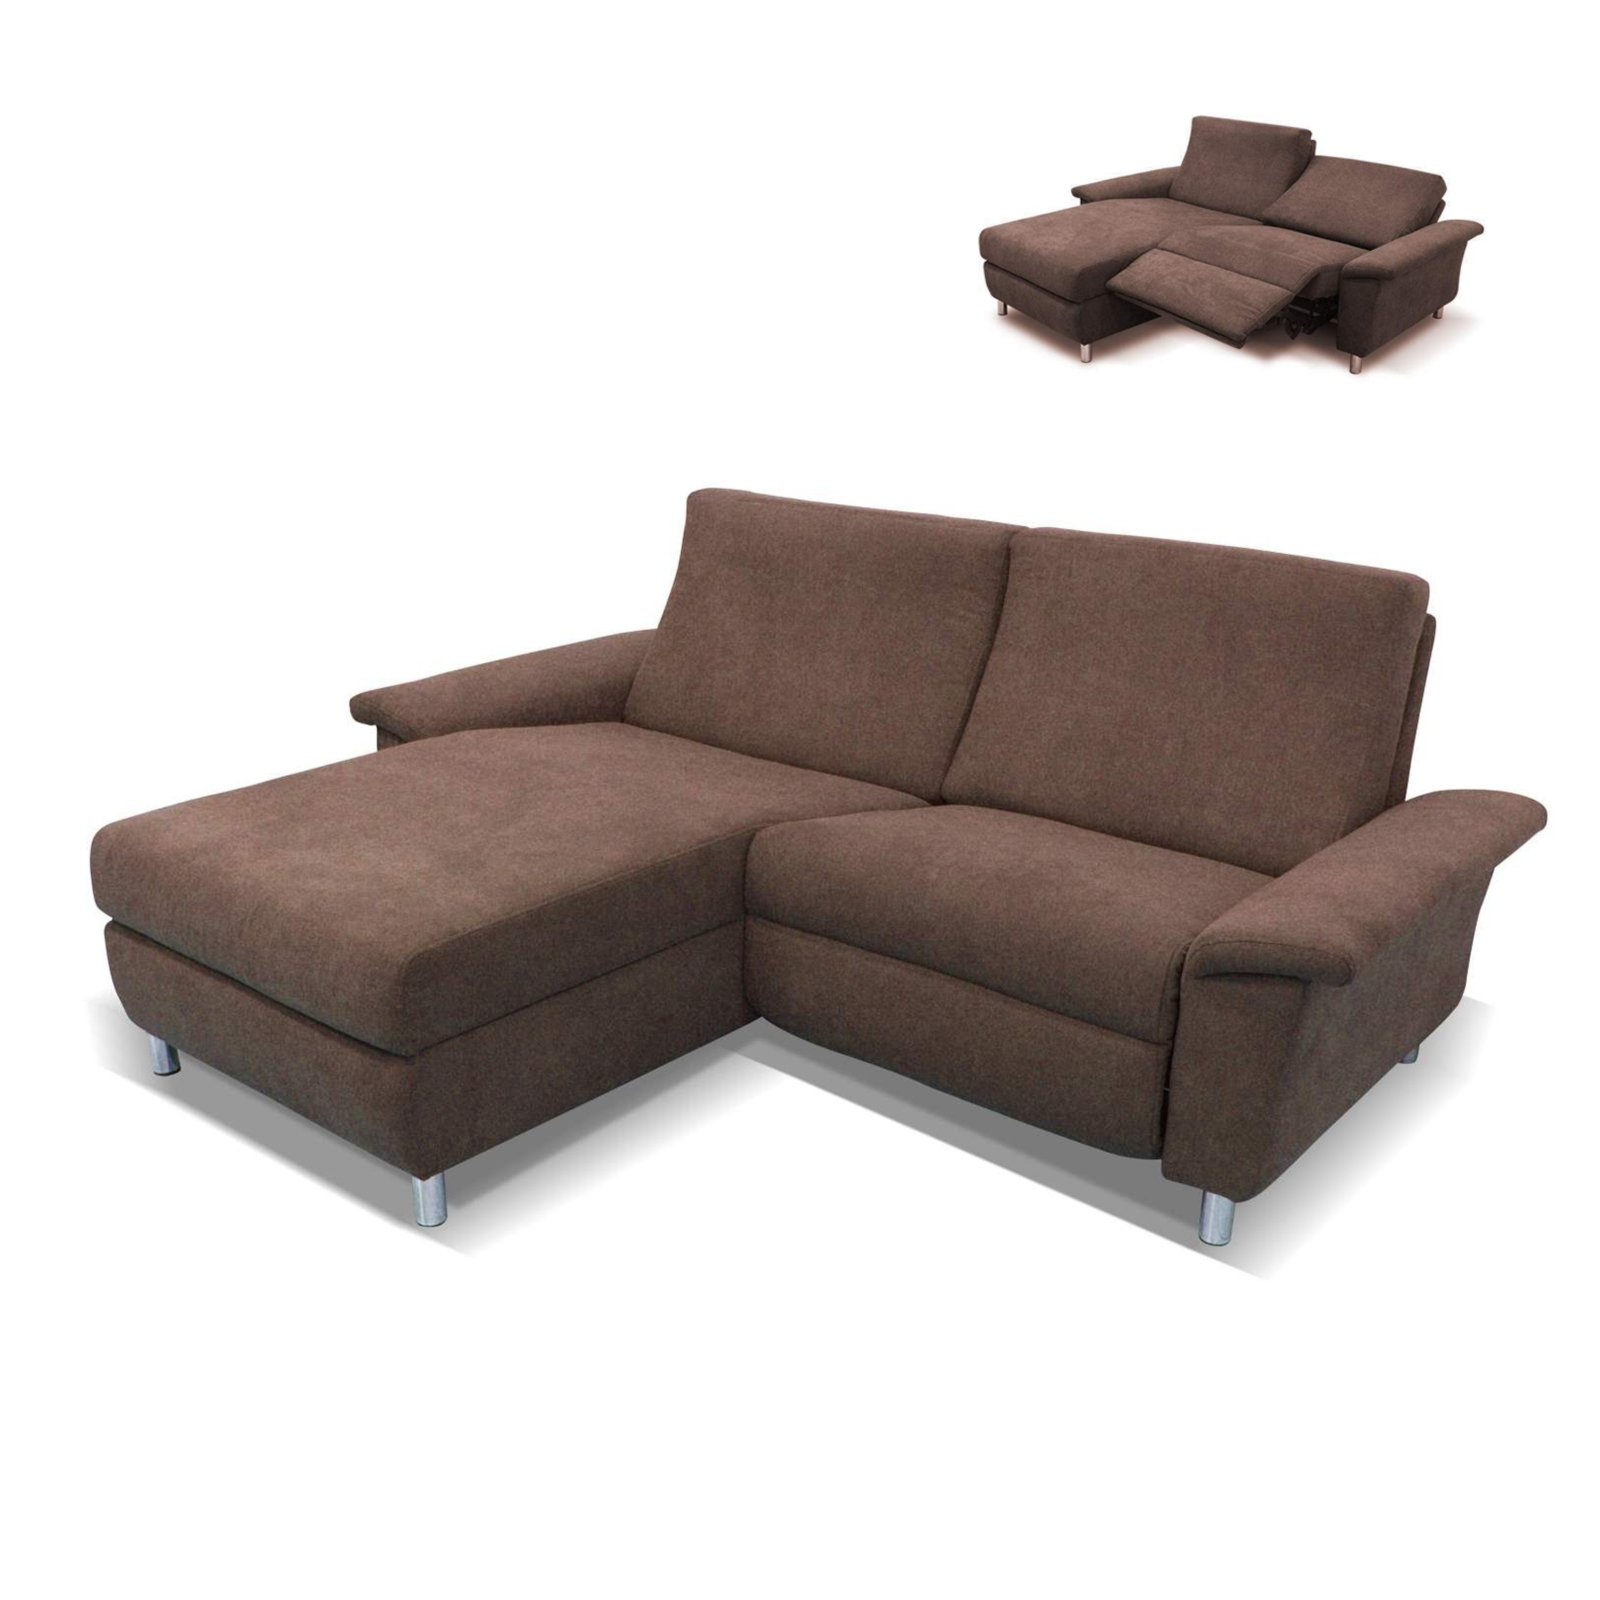 ecksofa braun recamiere links relaxfunktion ecksofas l form sofas couches m bel. Black Bedroom Furniture Sets. Home Design Ideas